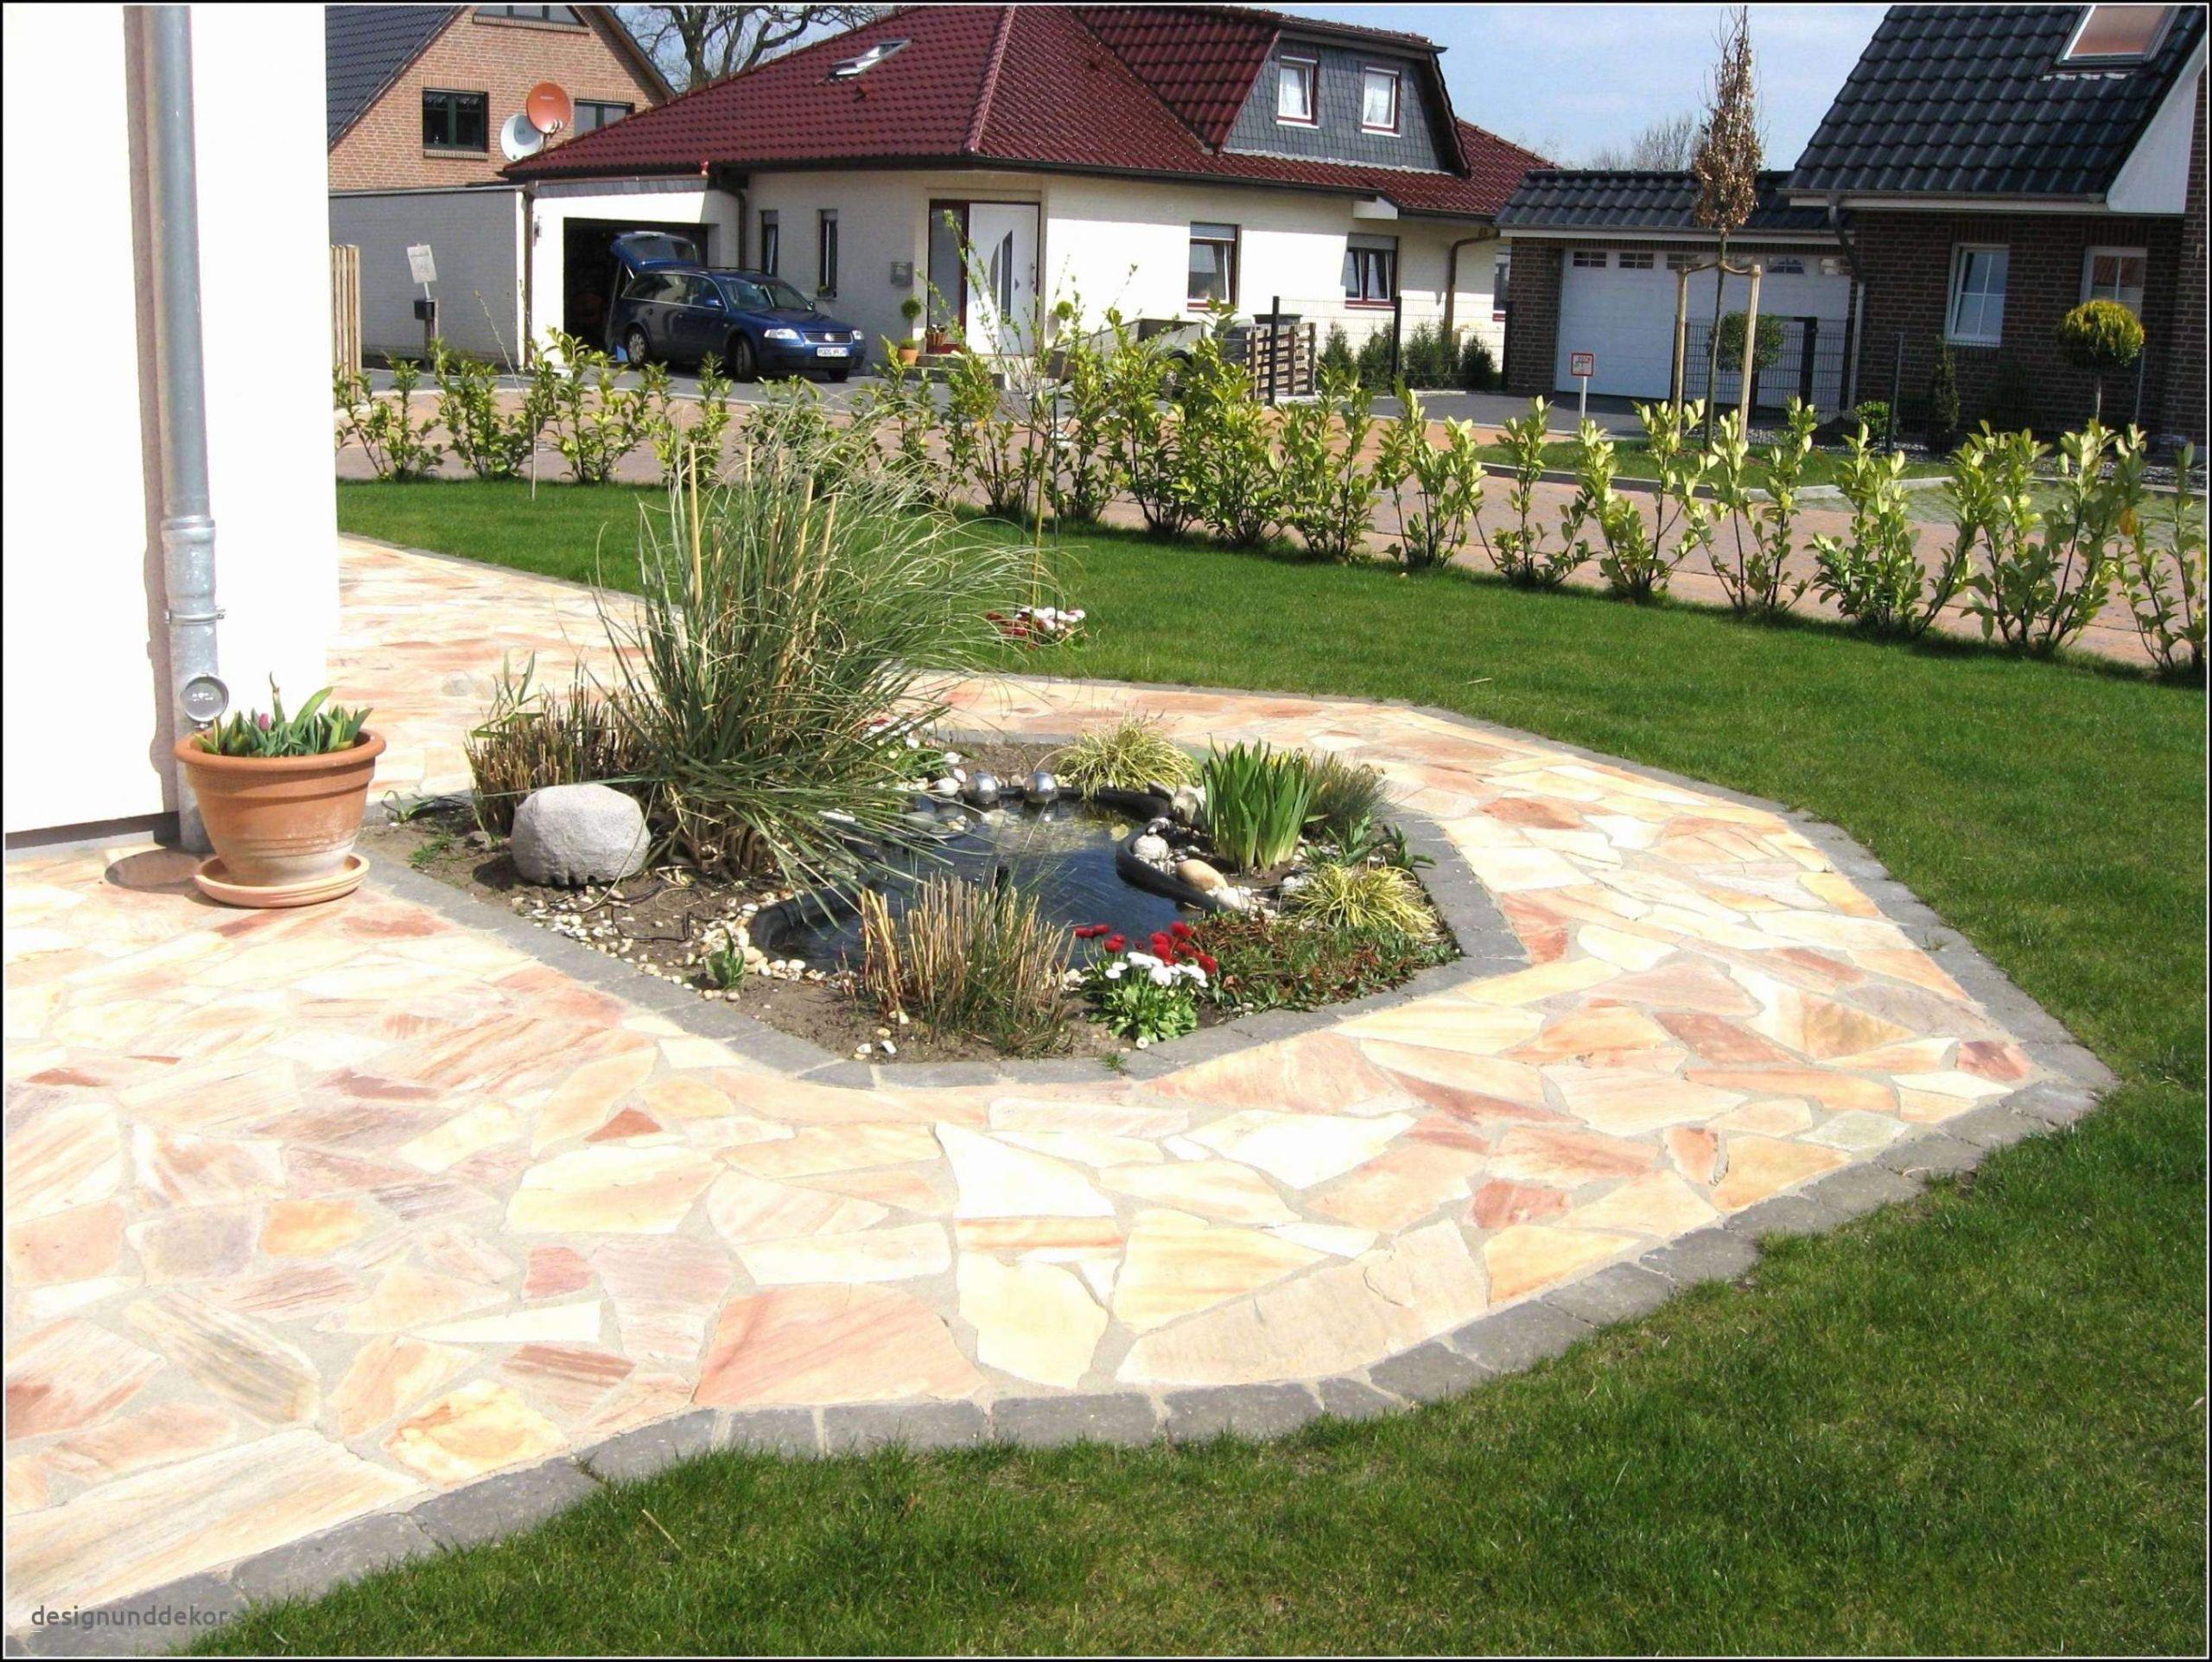 Naturnaher Garten Anlegen Neu 39 Reizend Naturnaher Garten Pflegeleicht Anlegen Elegant